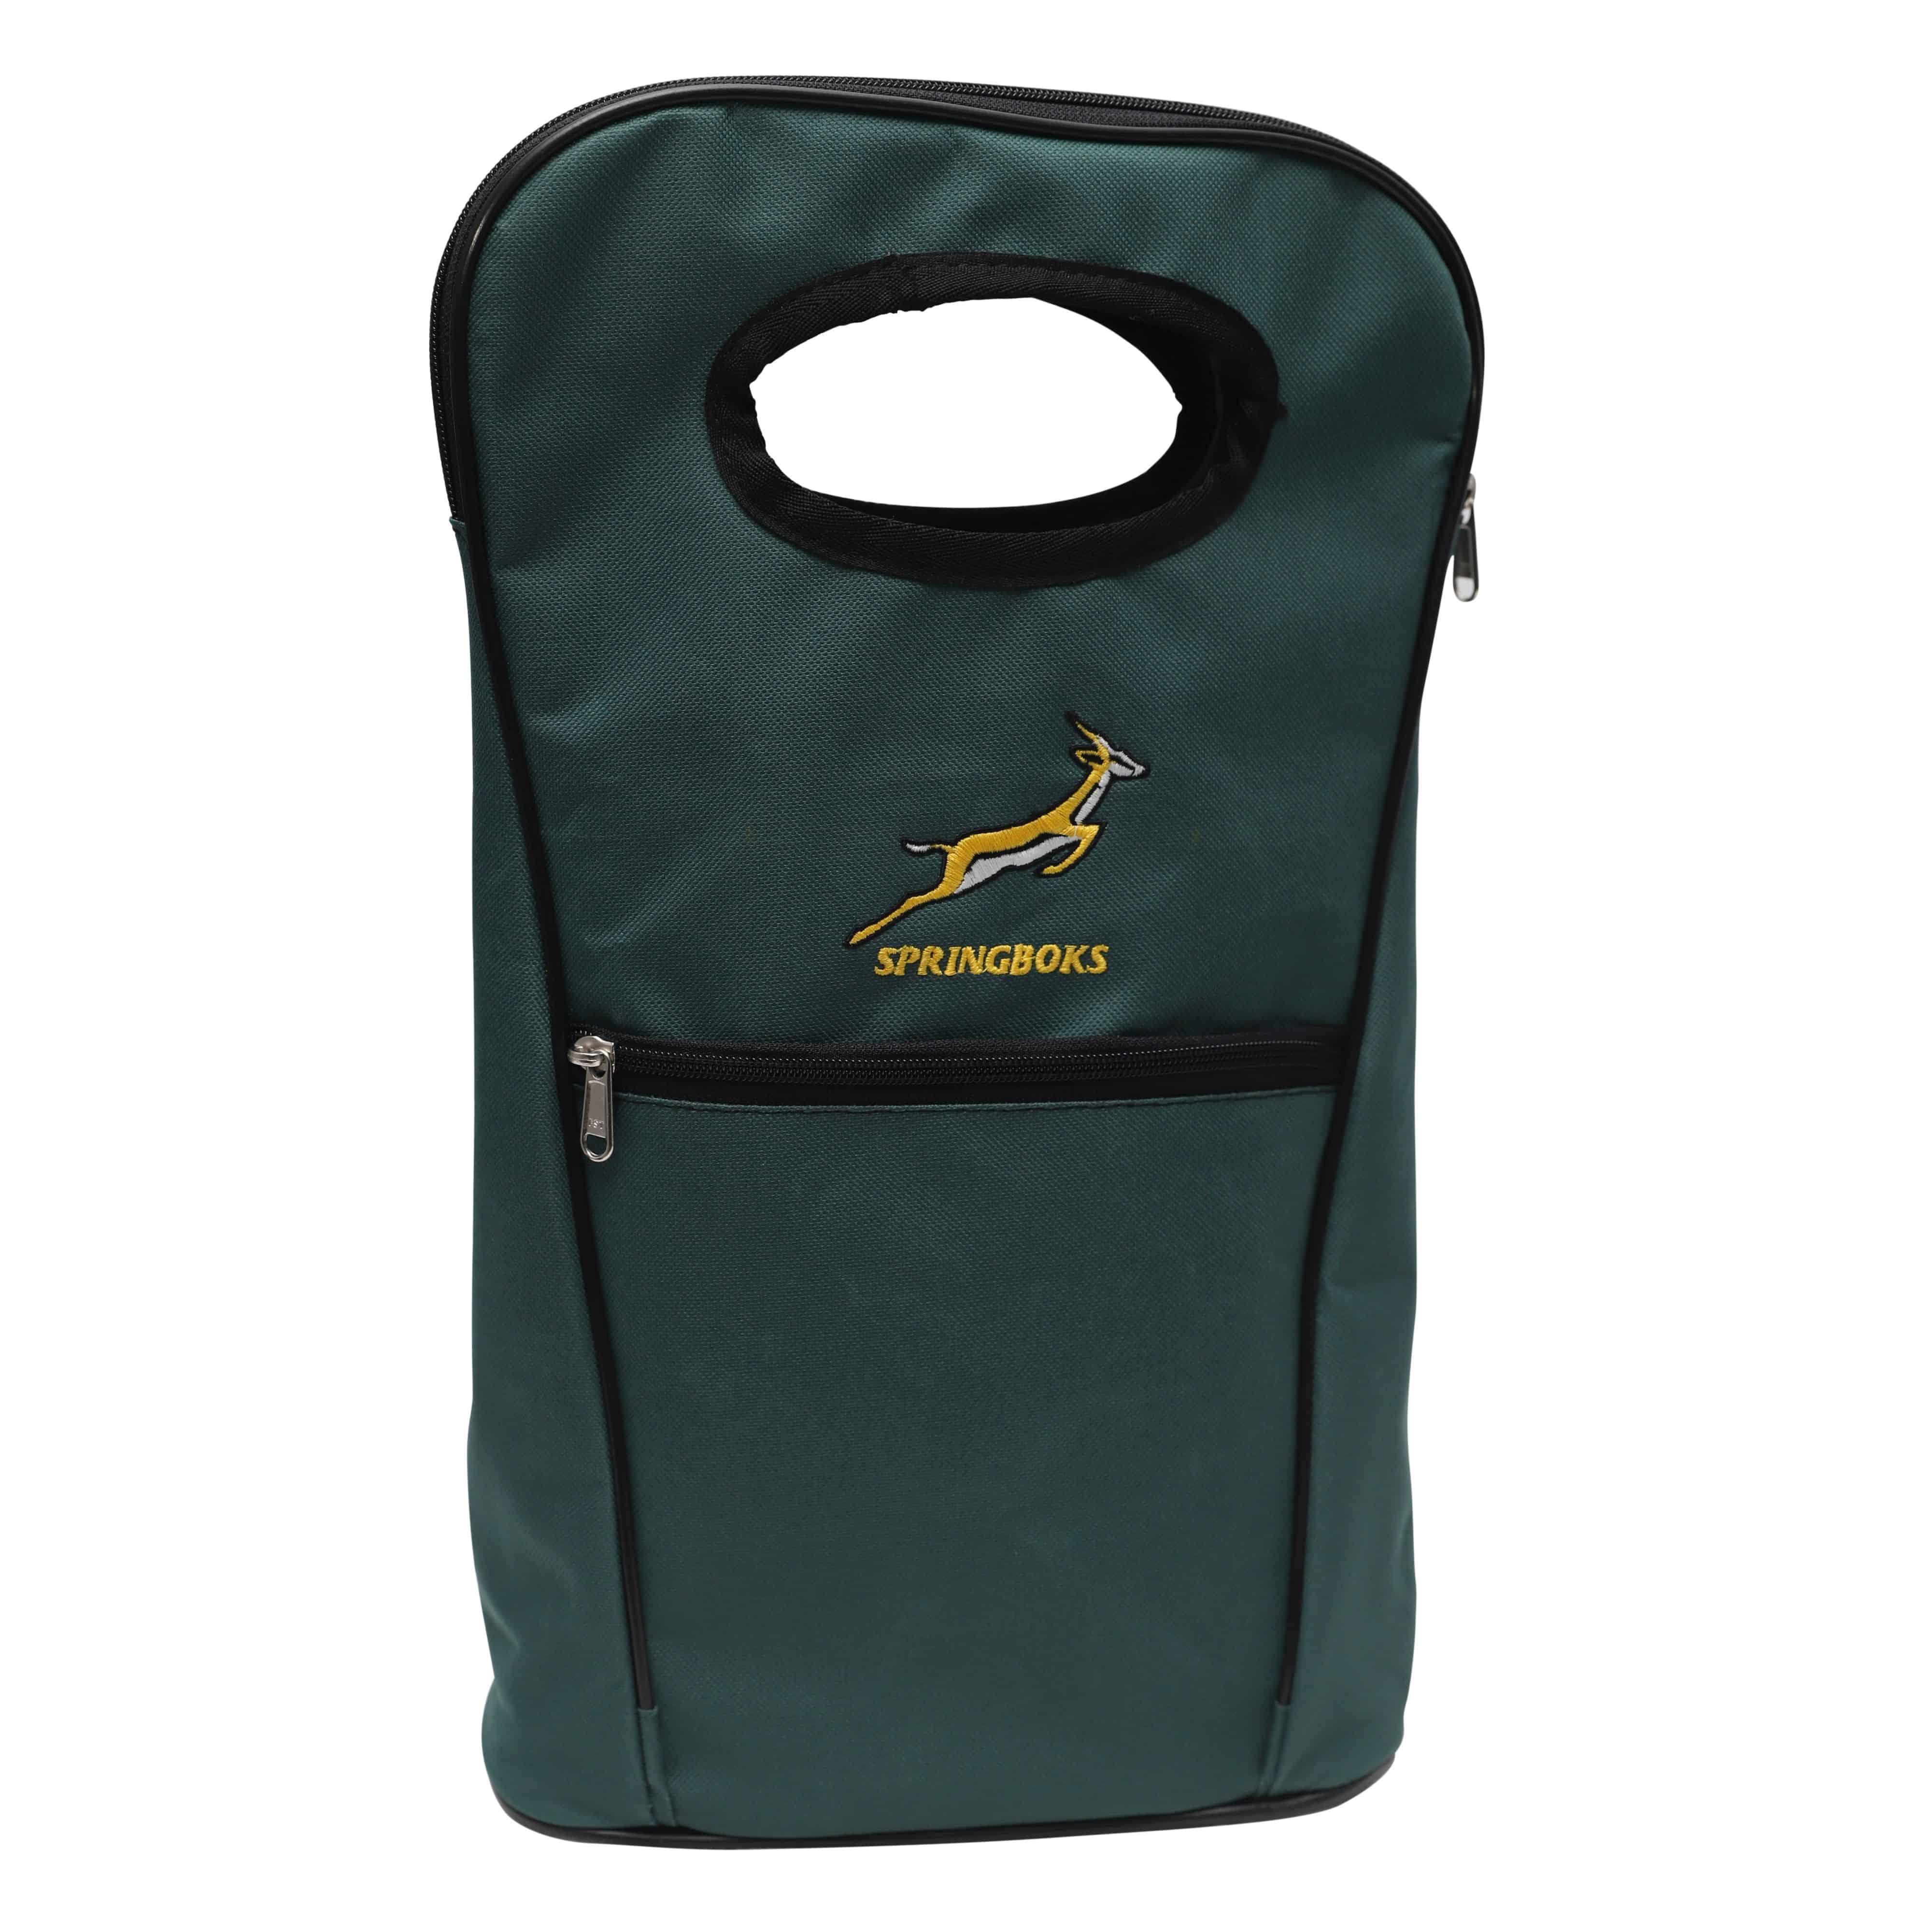 Springbok Wine Cooler Bag